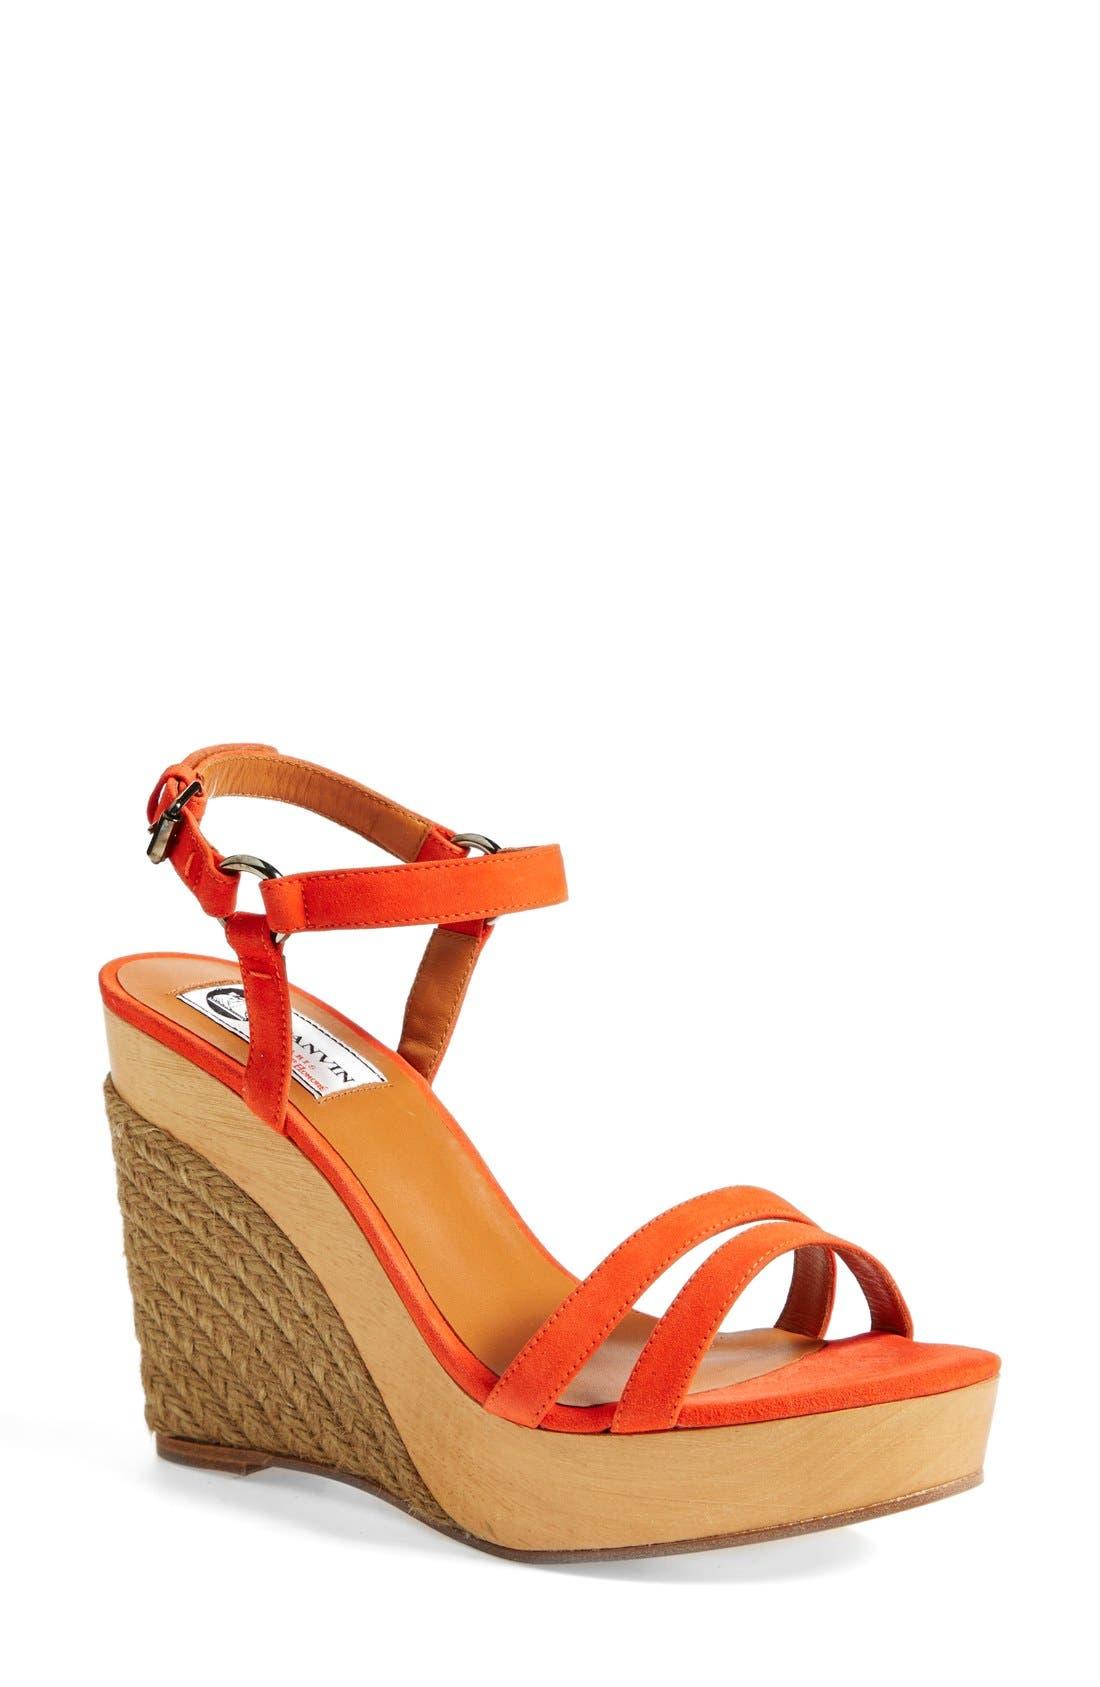 LANVIN Espadrille Wedge Sandal, Main, color, 800